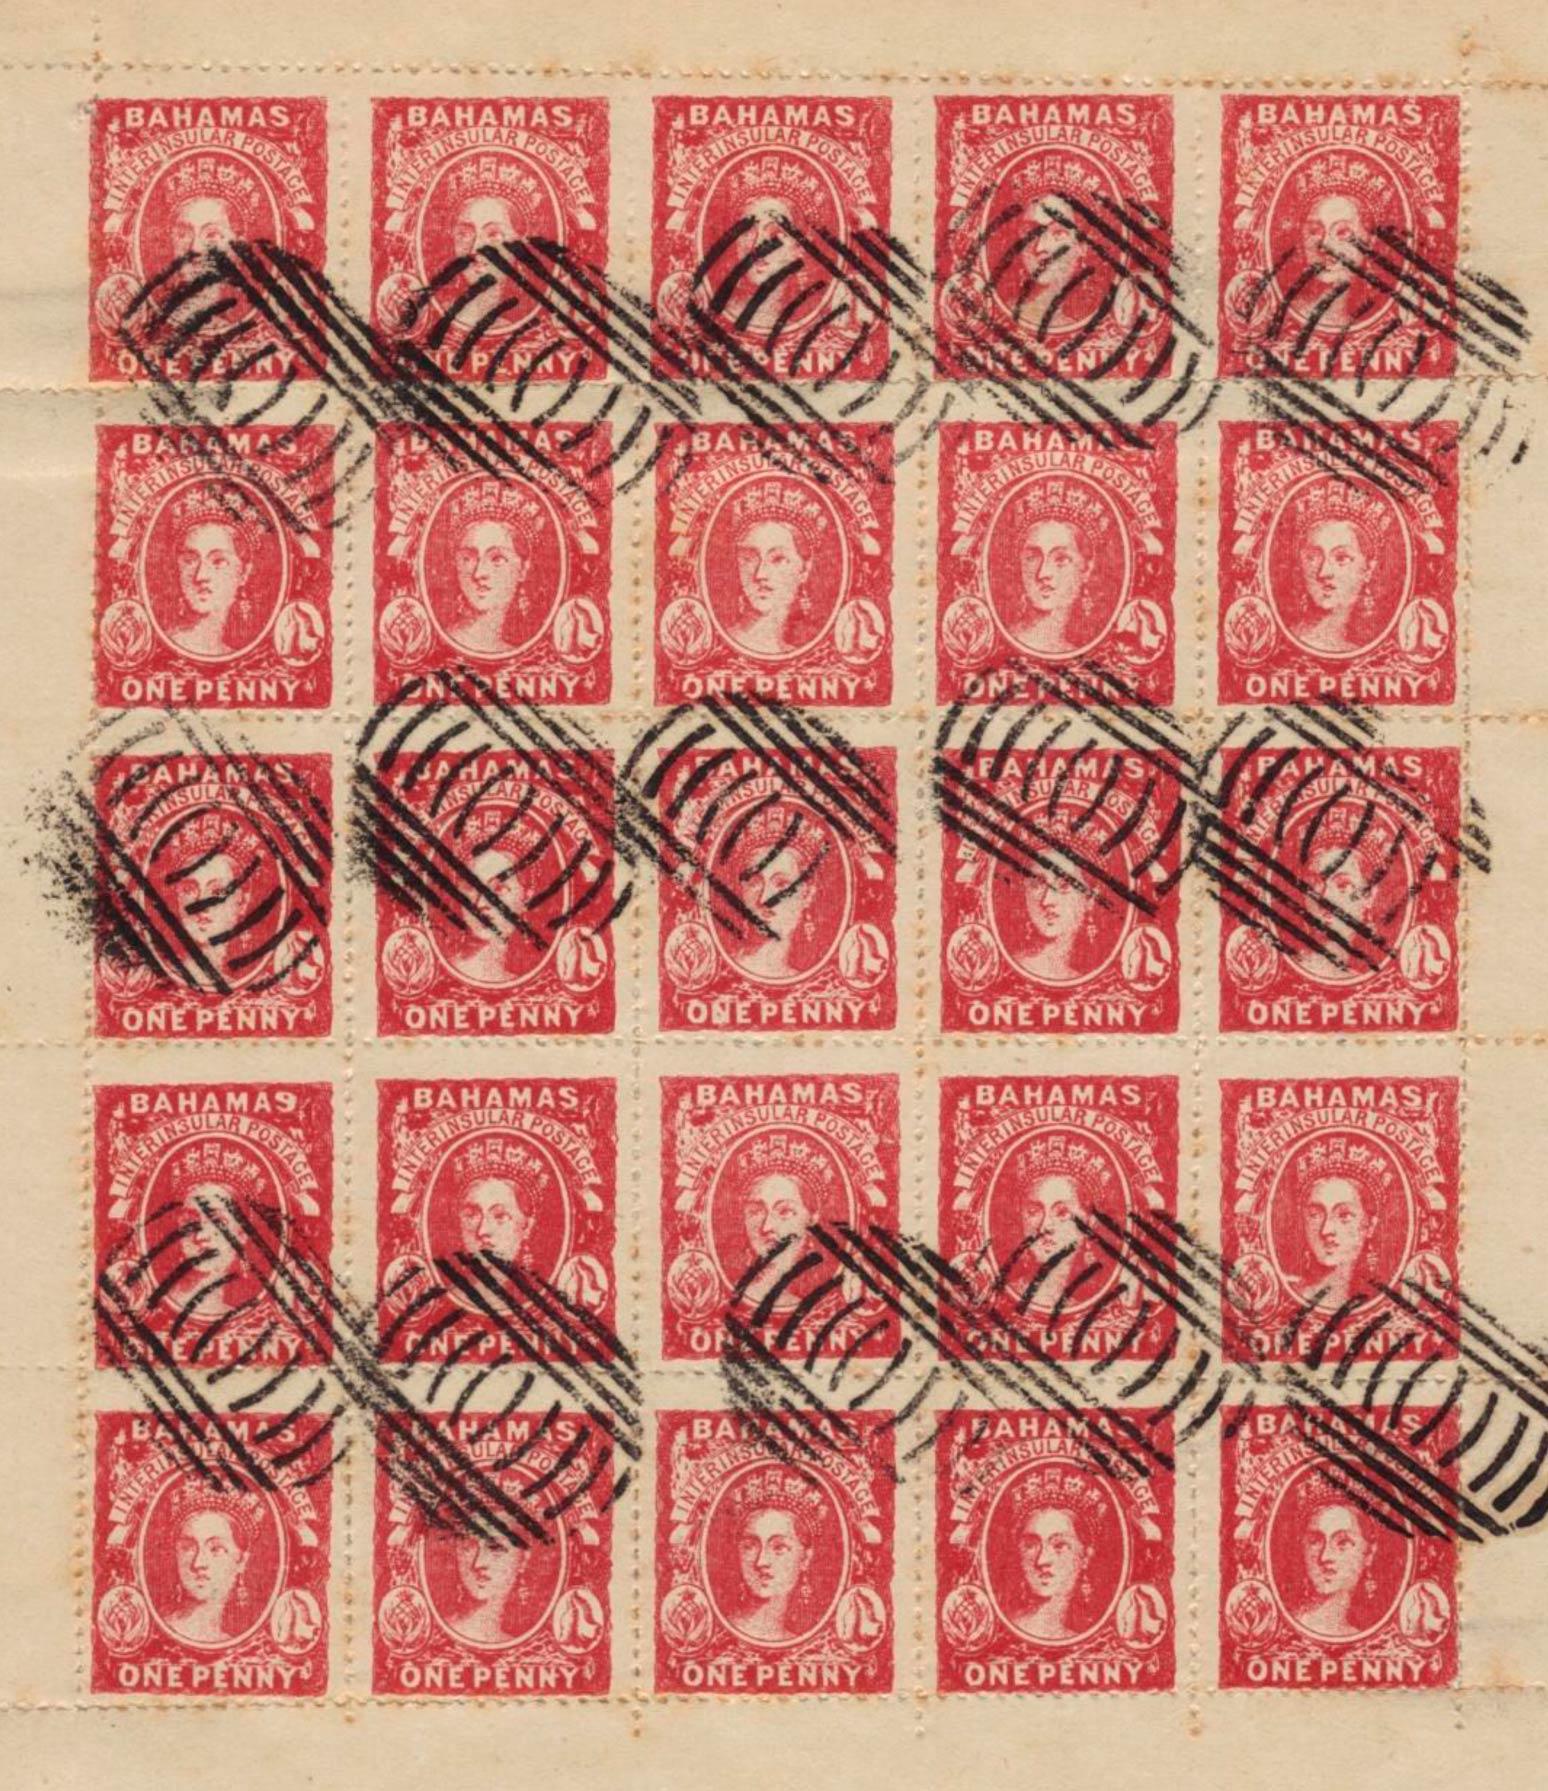 Bahamas_1861_1d_Spiro-sheet_Forgery